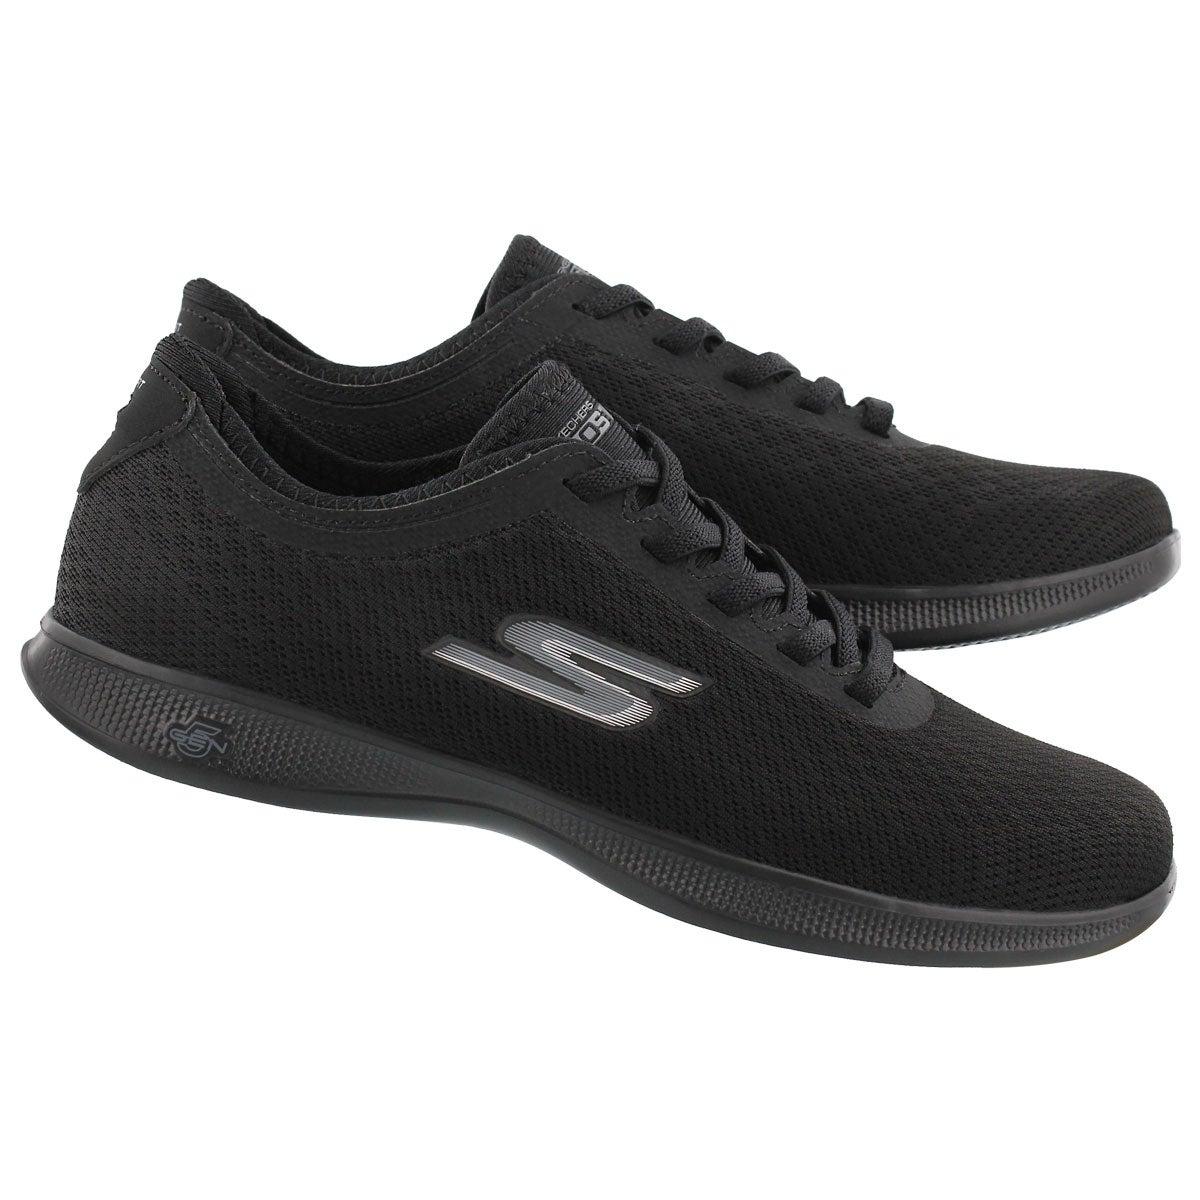 Lds GOstep Lite Dashing blk sneaker